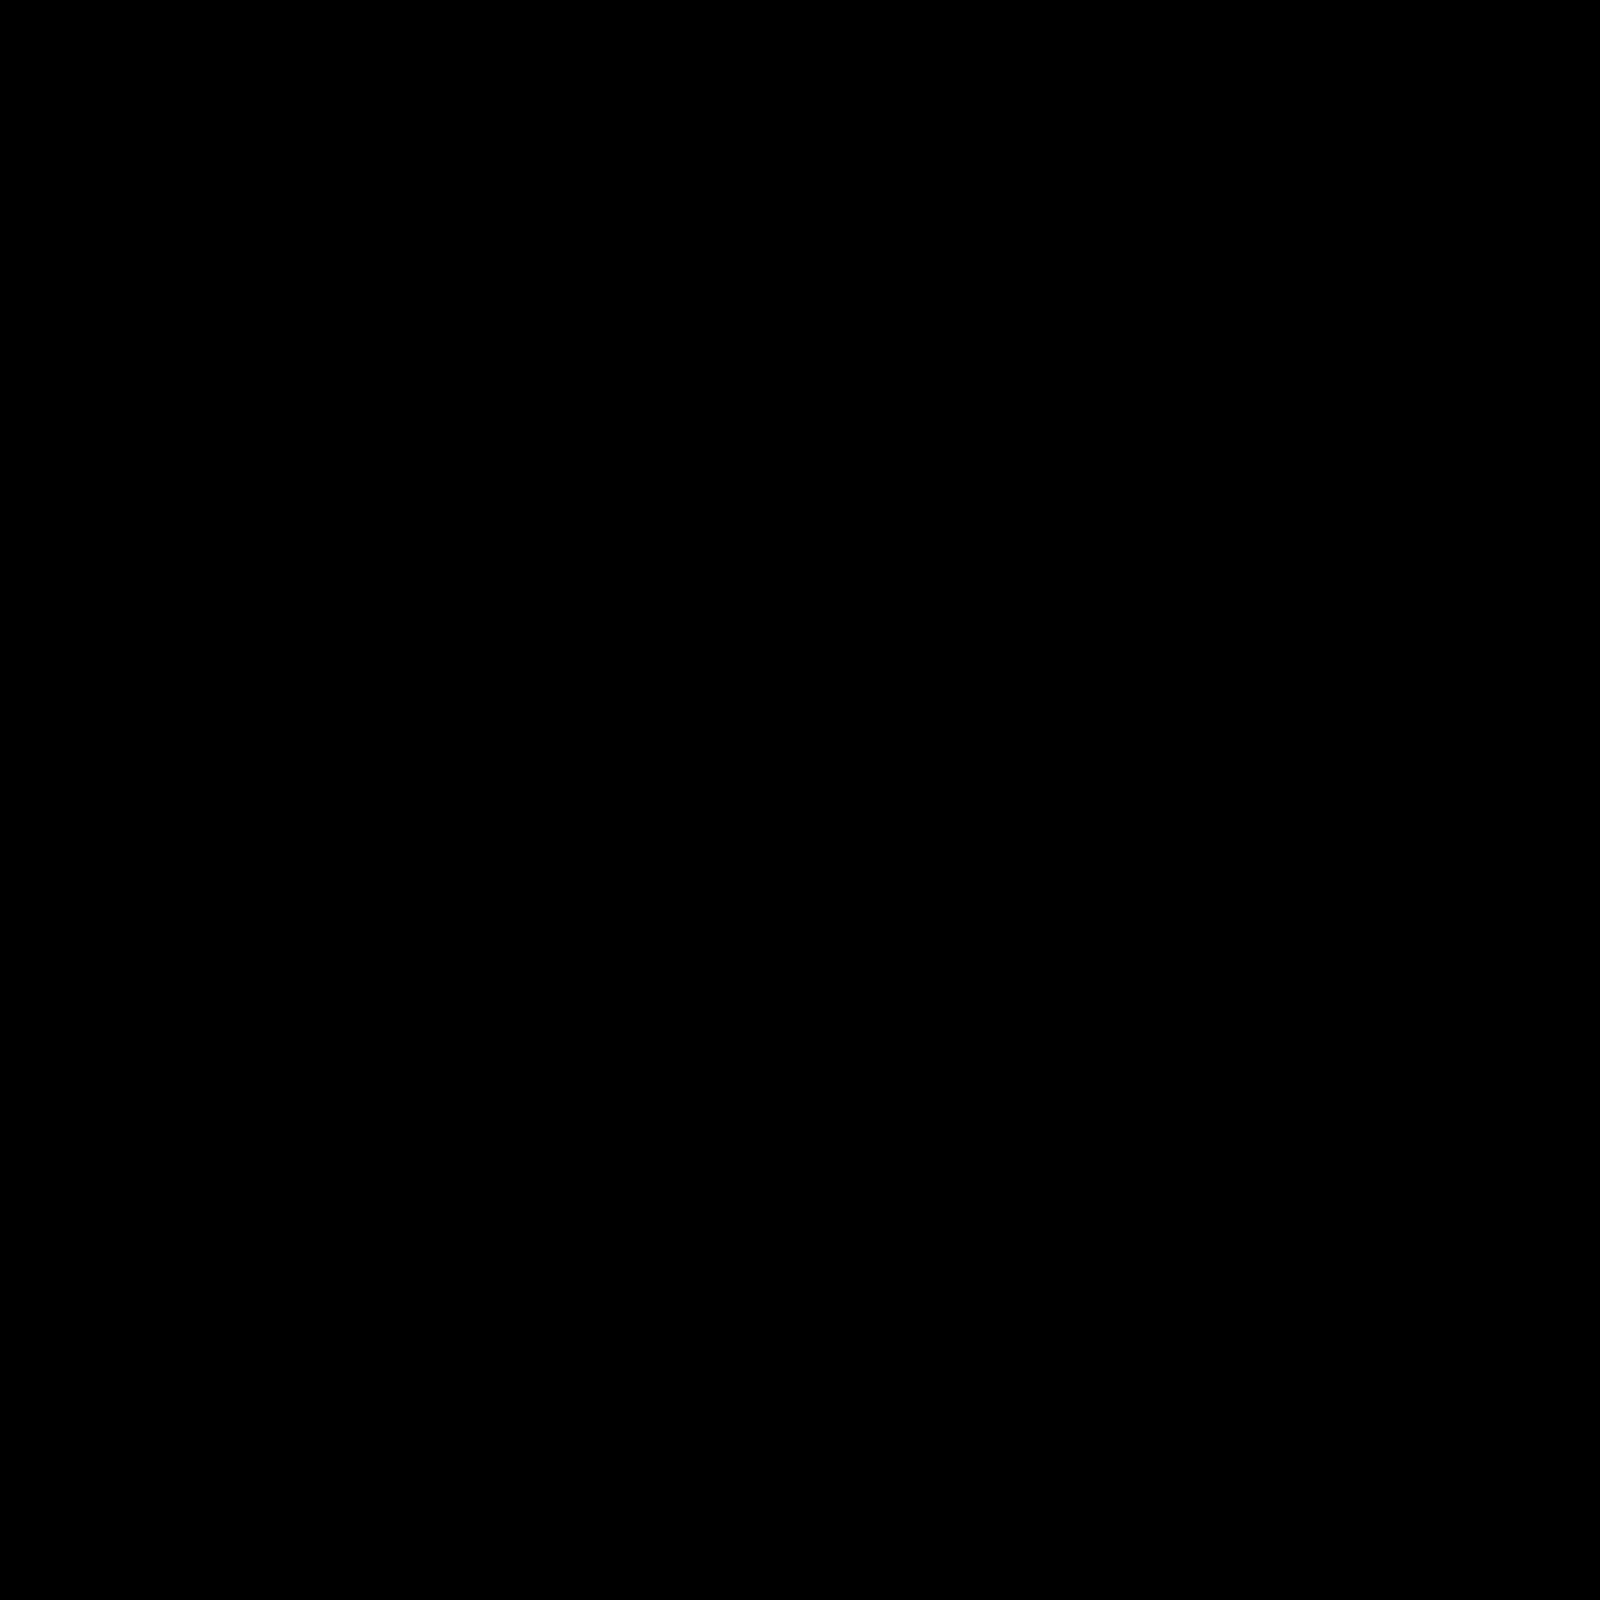 Technology clipart symbol. Wacom tablet icon free